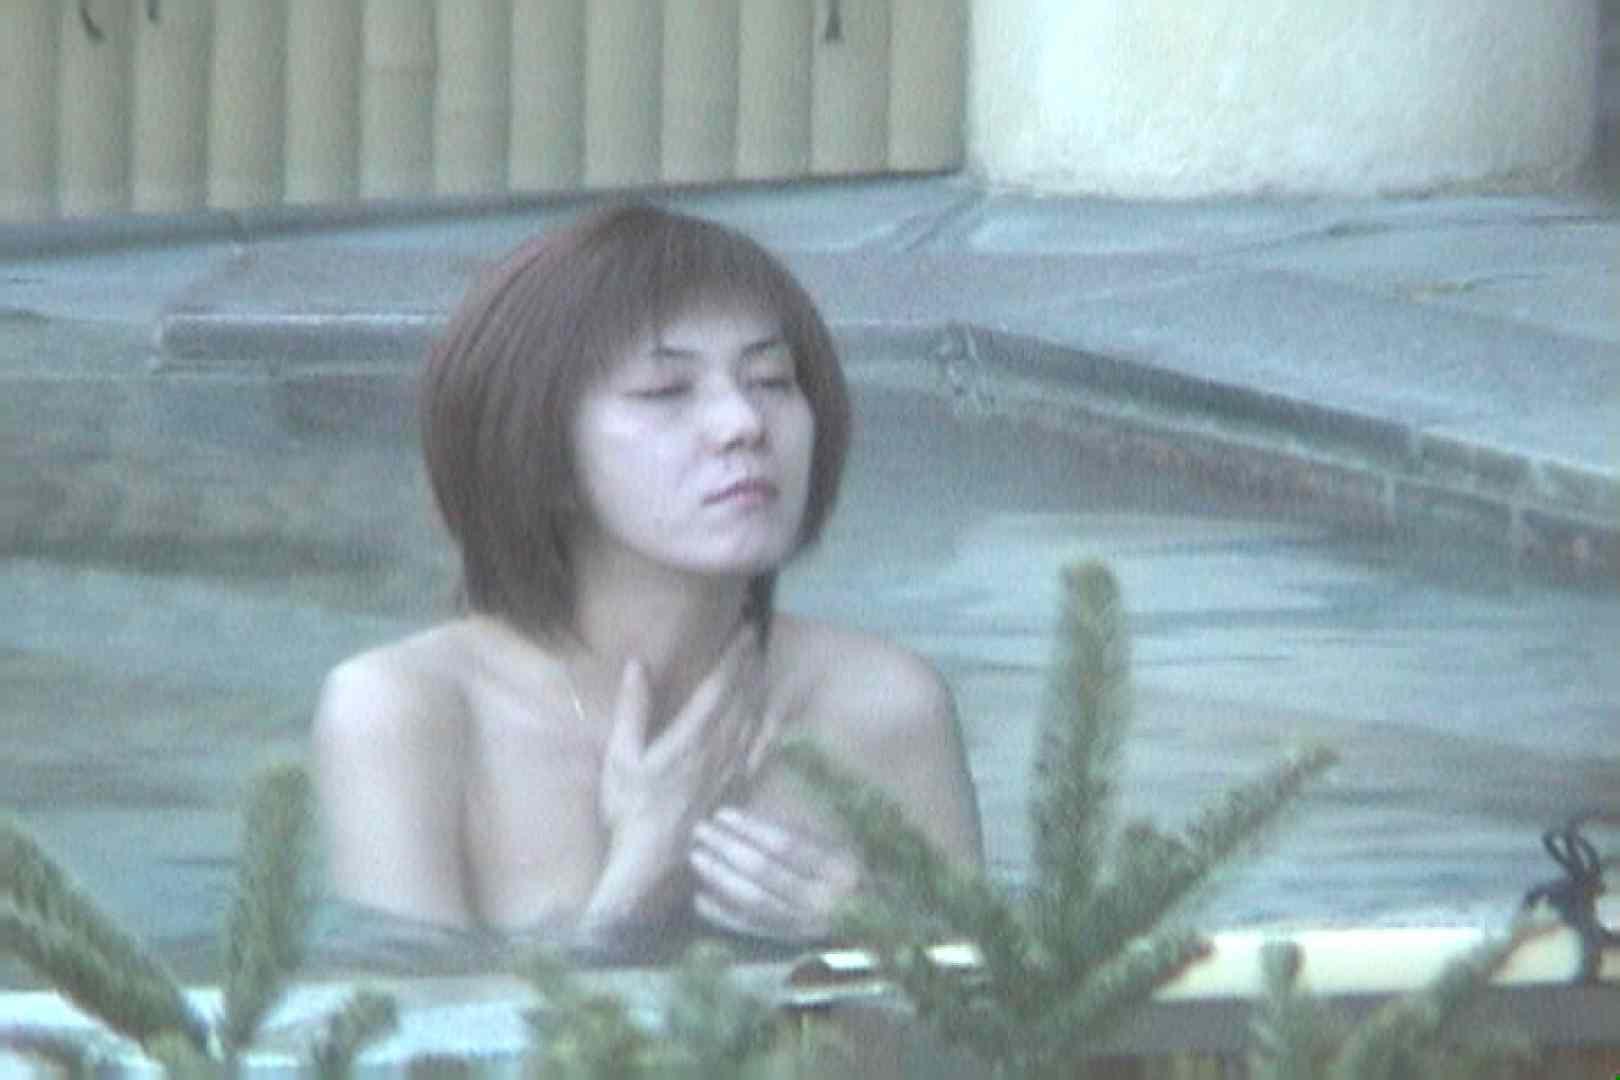 Aquaな露天風呂Vol.560 露天 | HなOL  62pic 30